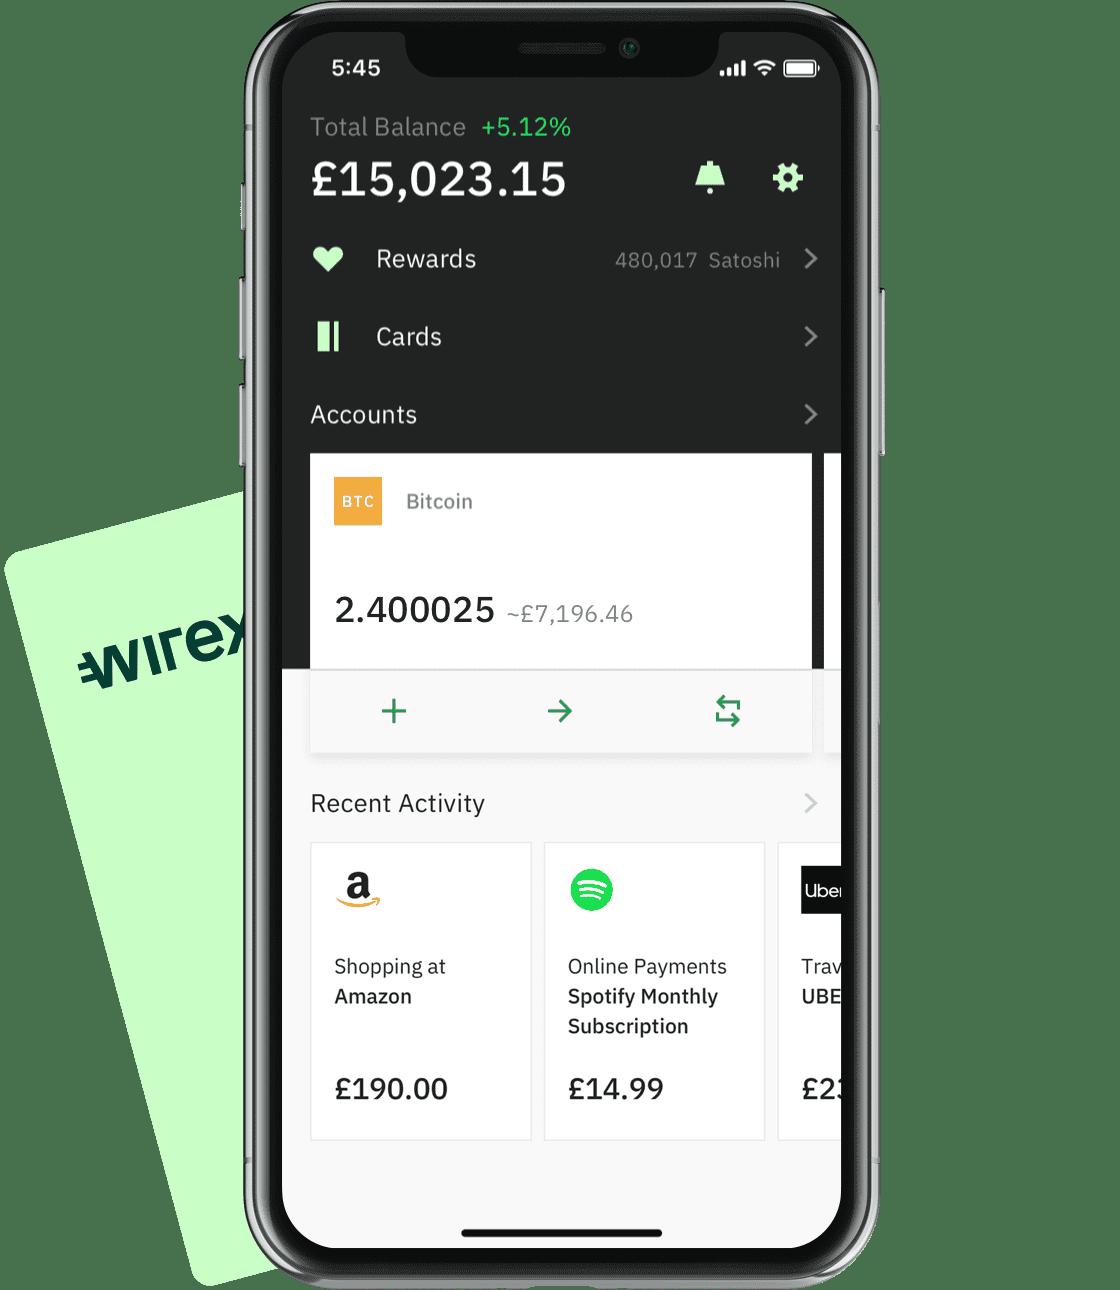 Xbt usd tradingview - Account Options